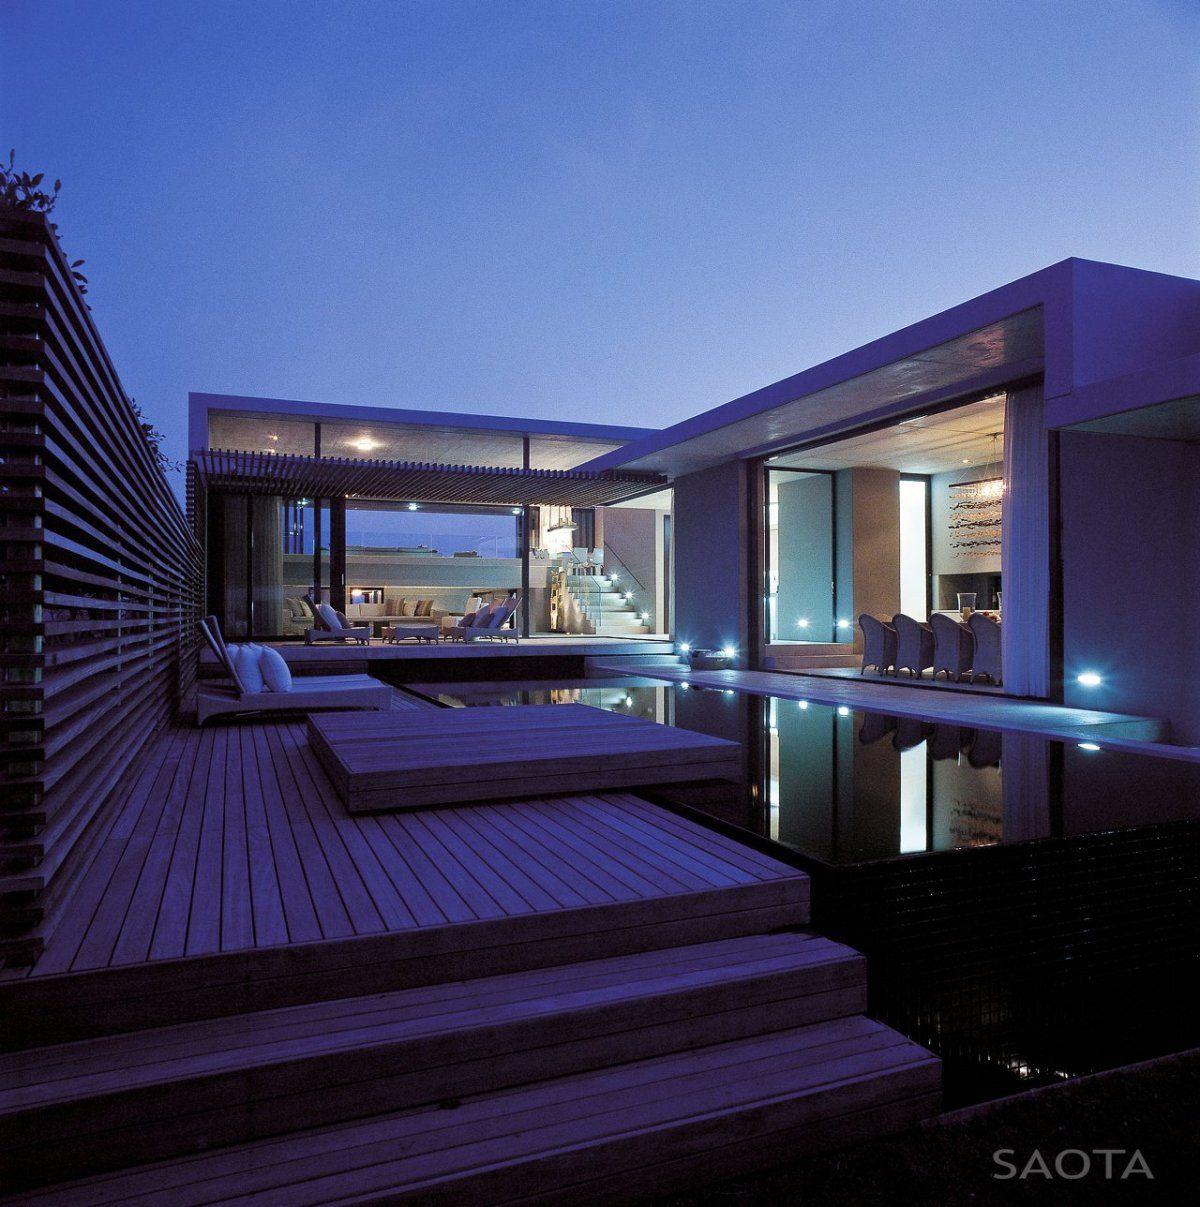 Voelklip House, Hermanus, South Africa by SAOTA and ANTONI ASSOCIATES